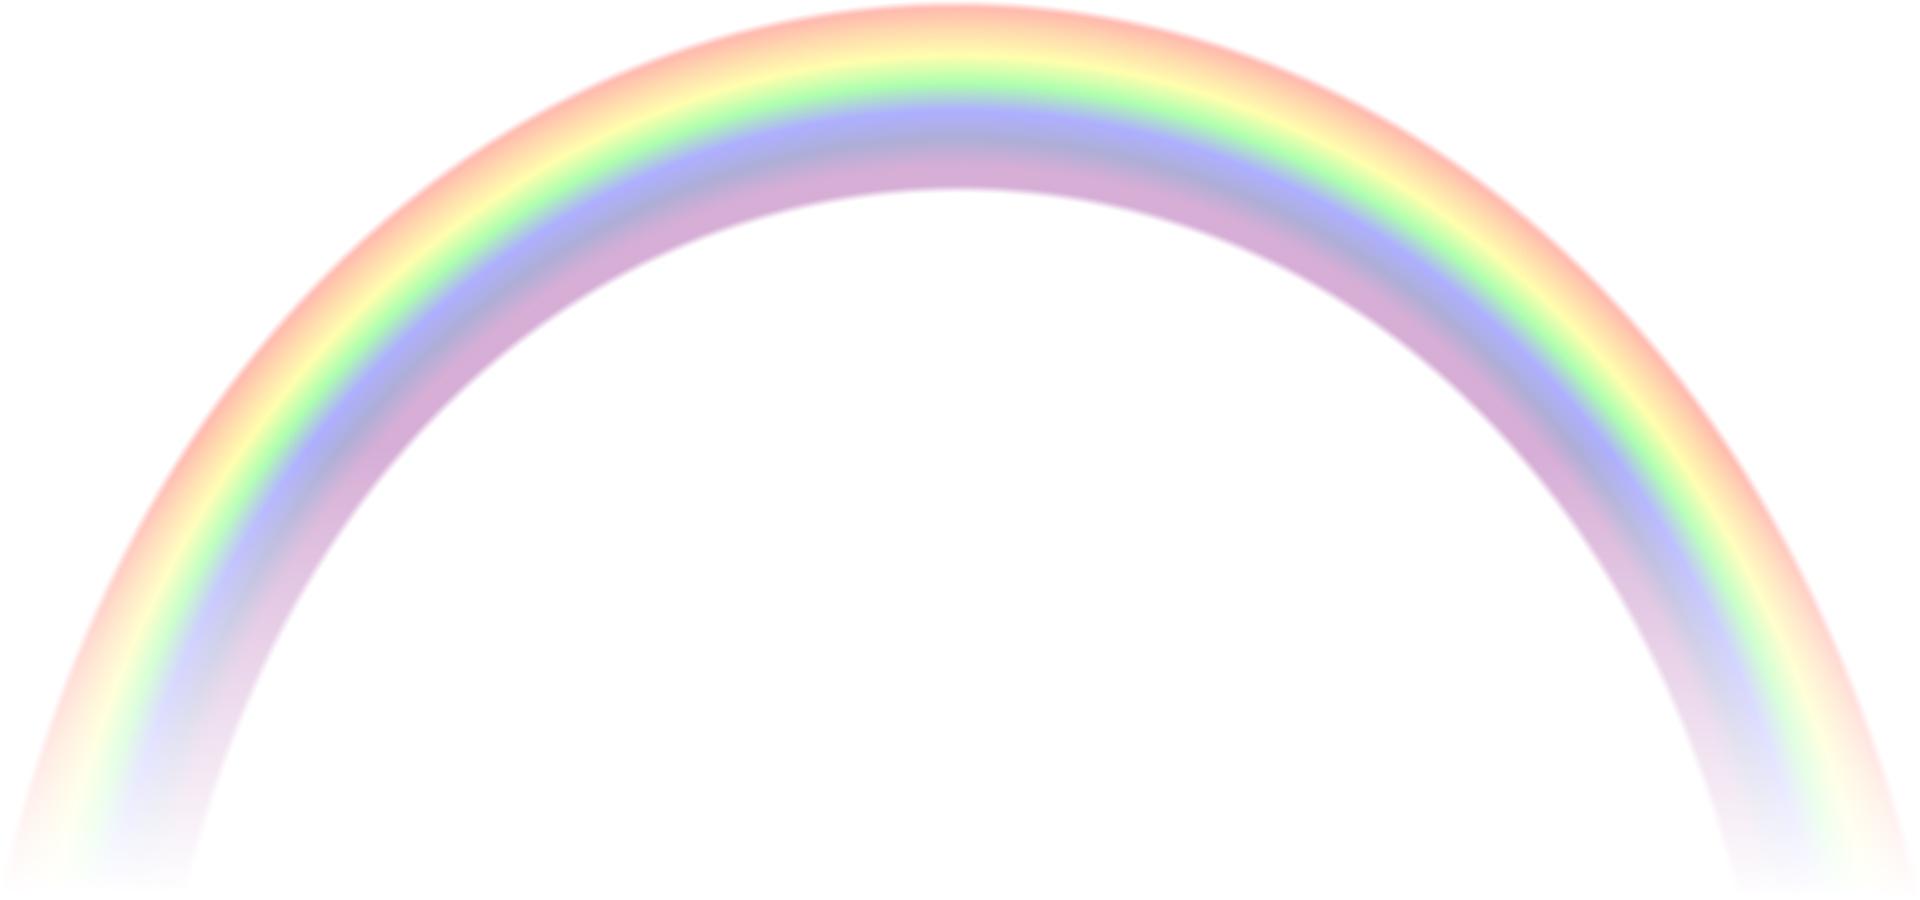 rainbow-764189_1920 copy